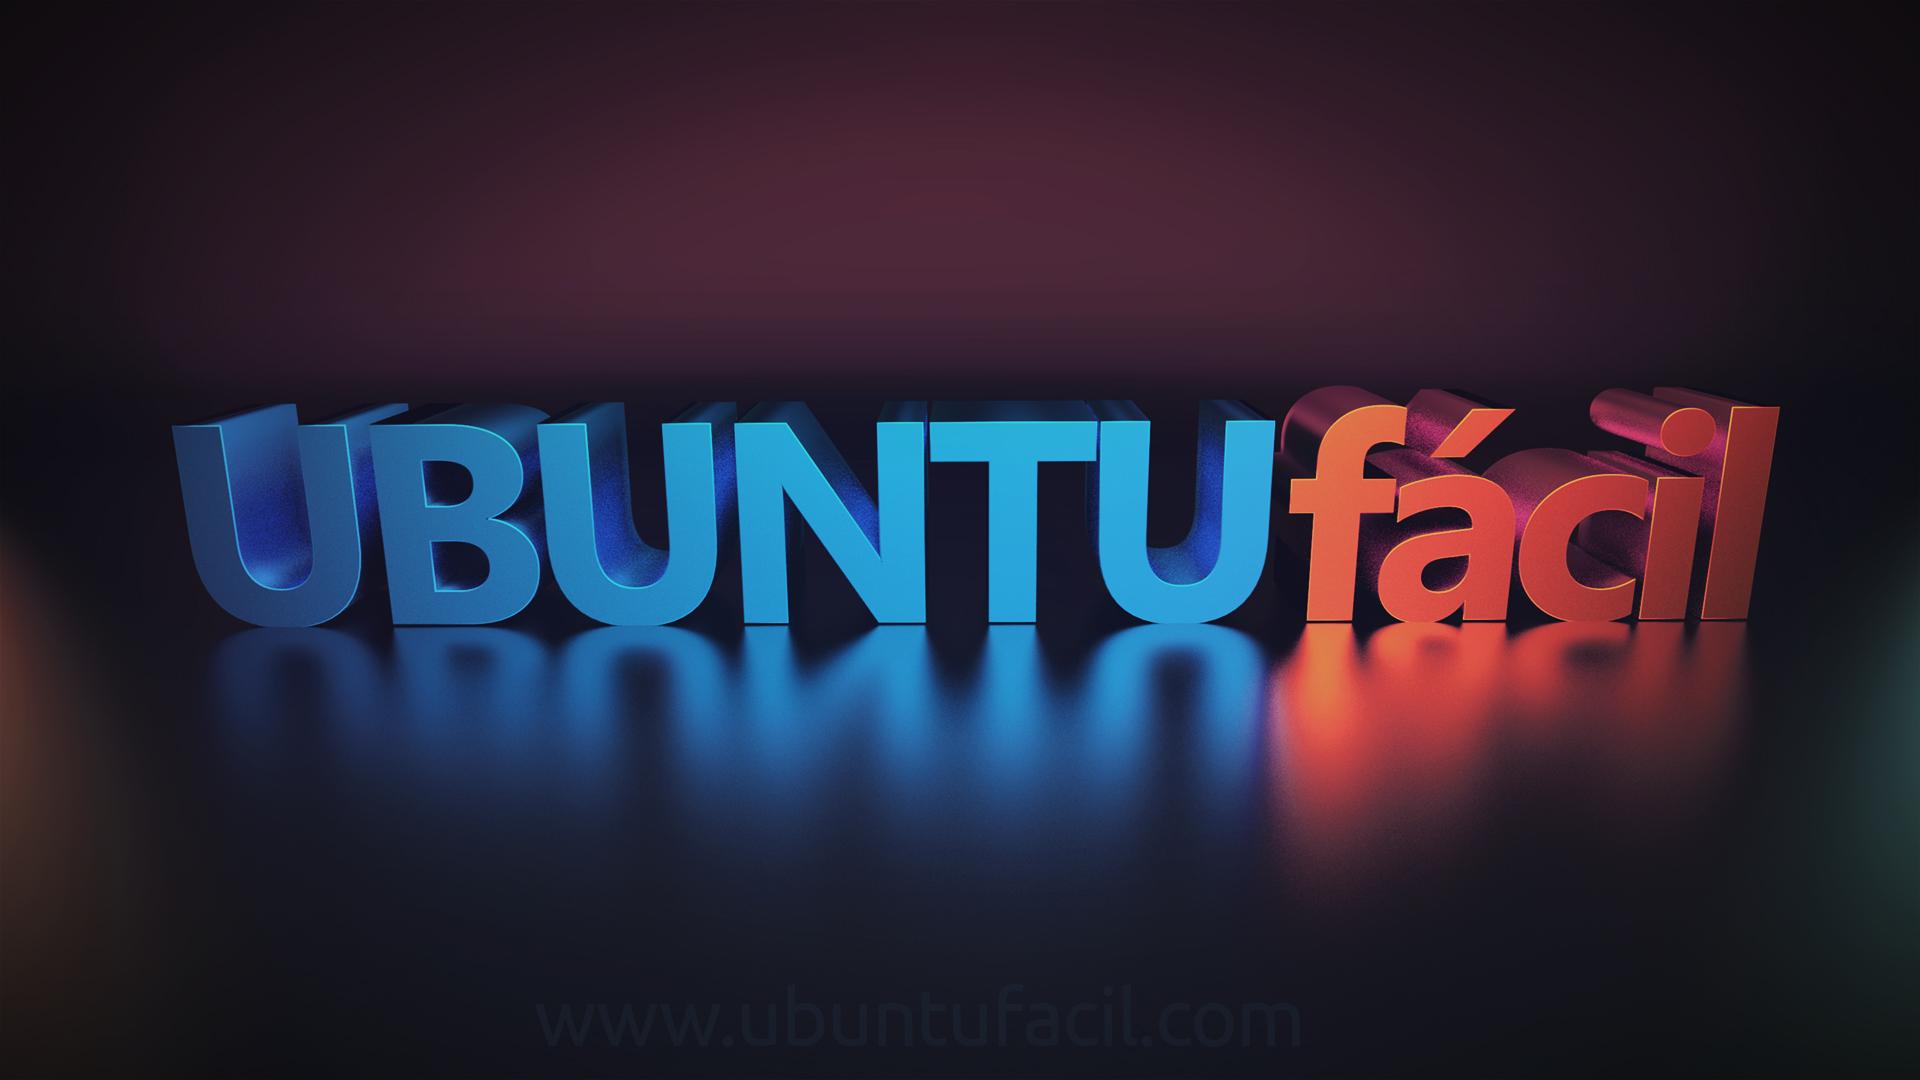 ubuntu-facil-blender-wallpaper-1080p-2